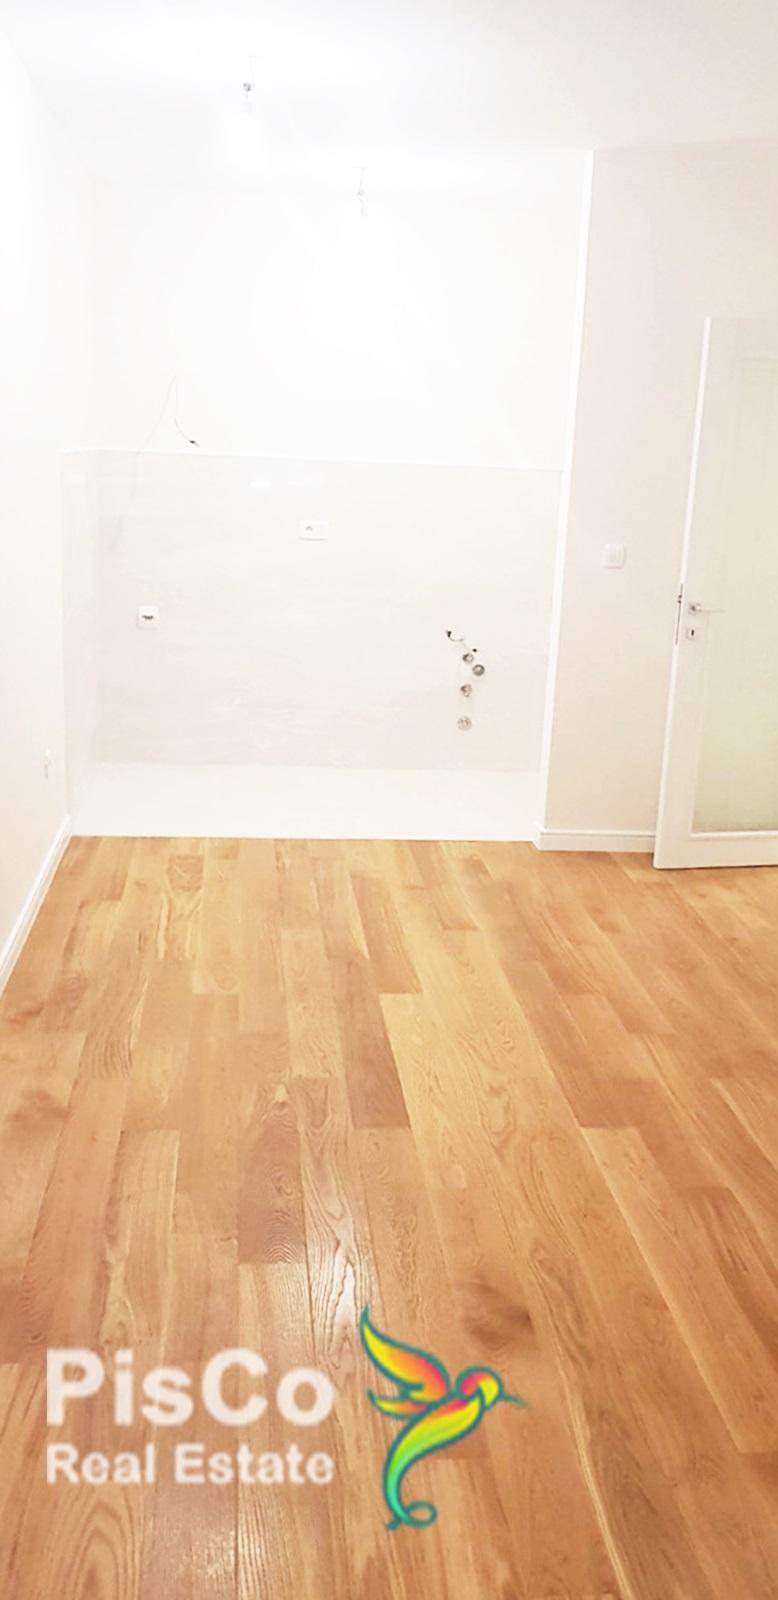 Na prodaju Nov, neuseljavan jednosoban stan u Central Pointu 49,22m2